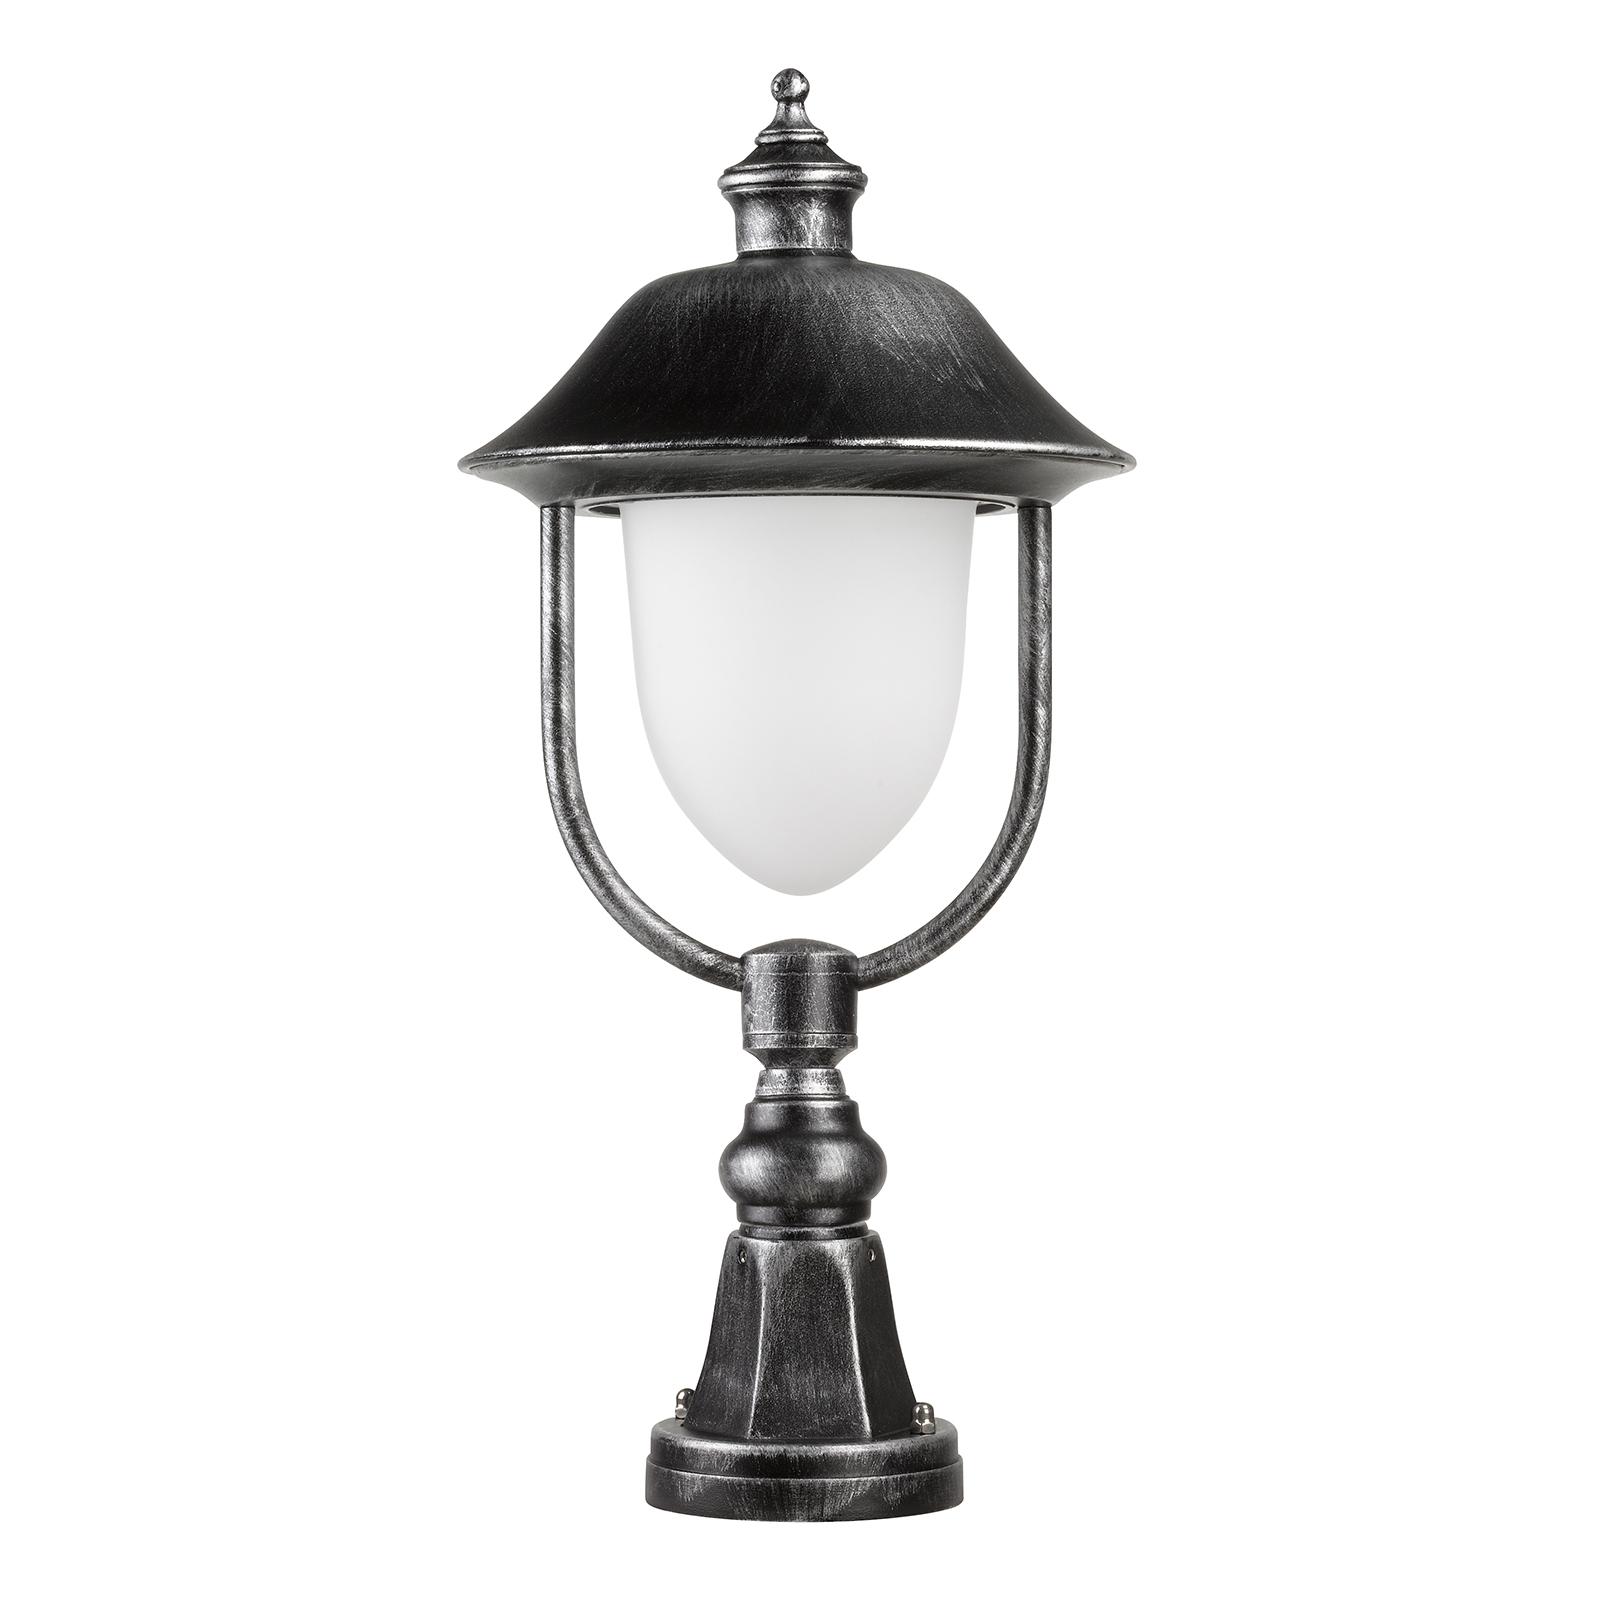 Pollarilamppu 1156, musta/hopea